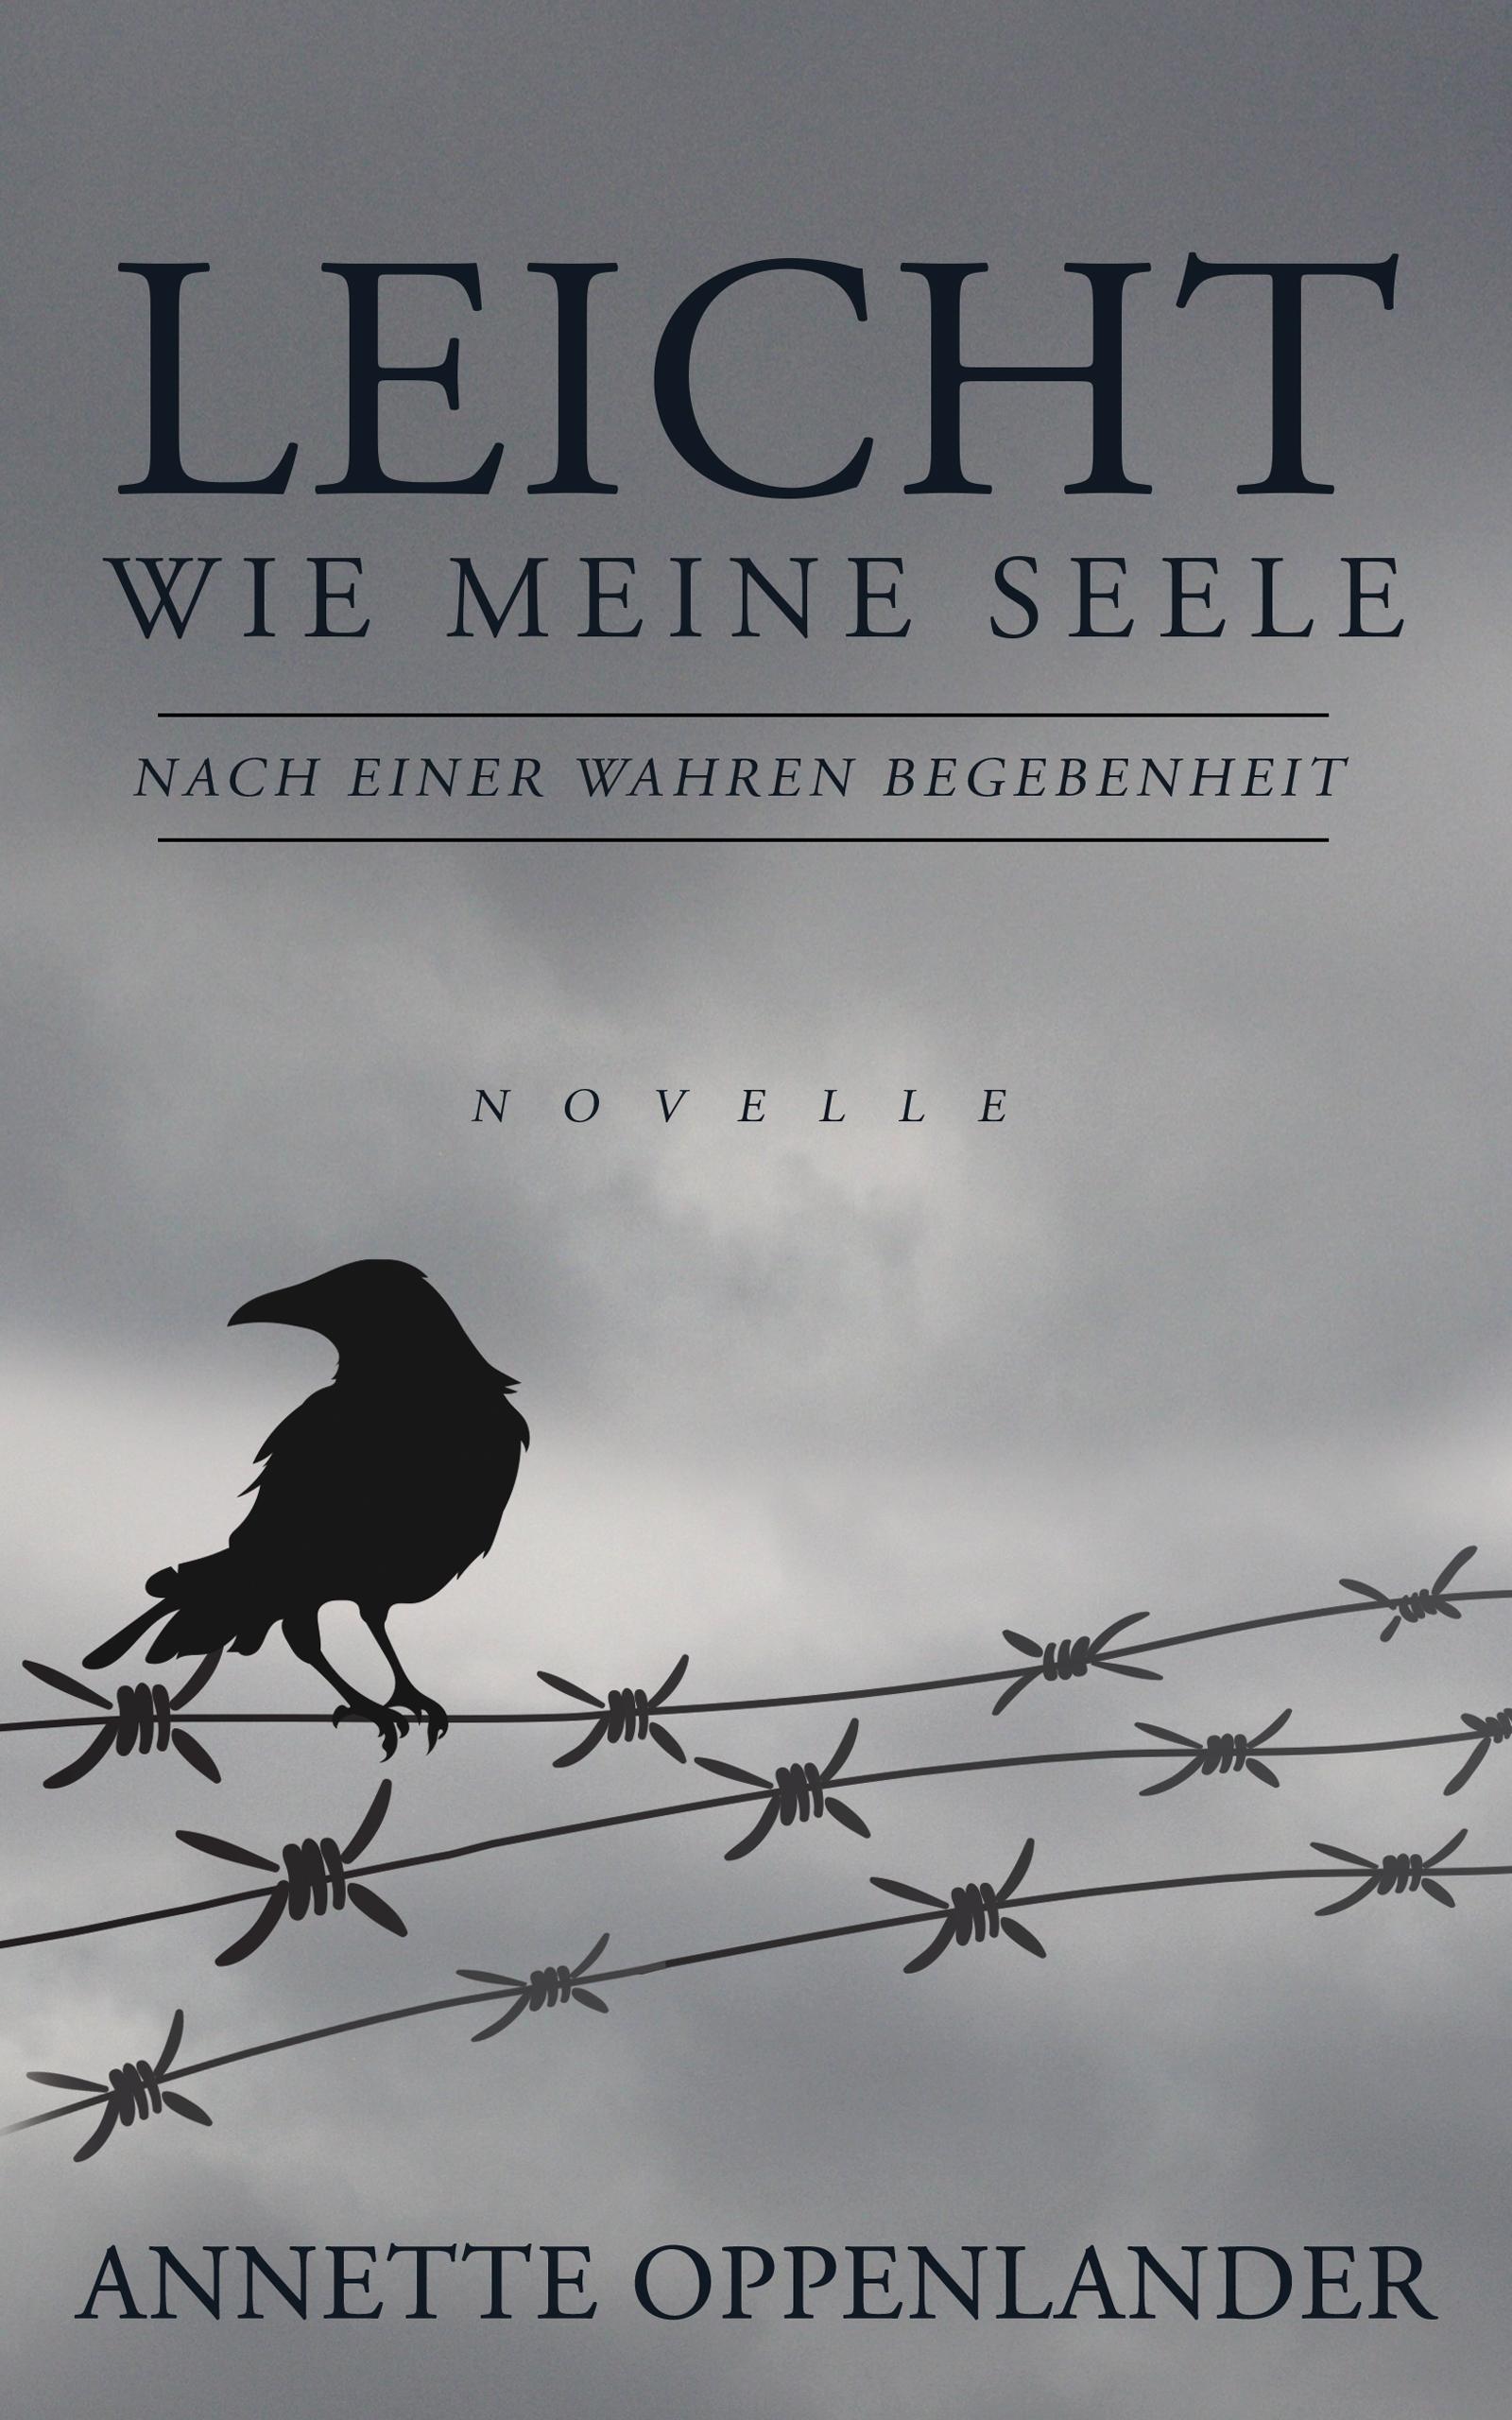 buch cover Novelle zweiter weltkrieg